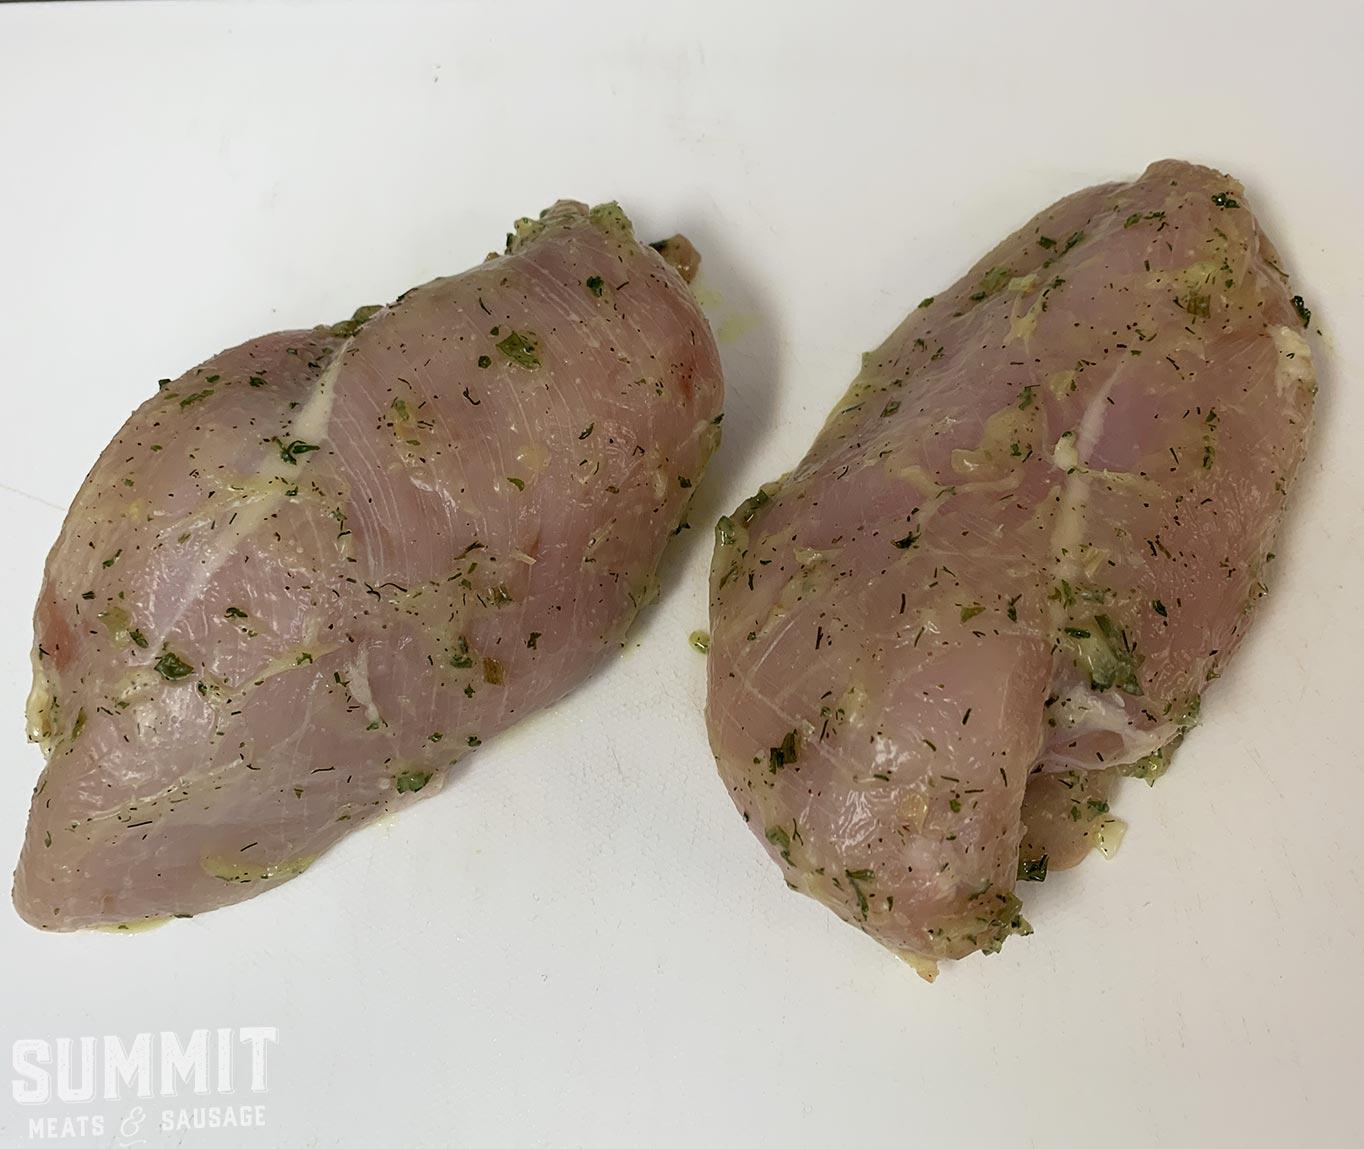 Butter Herb Chicken Breast - Summit Meats